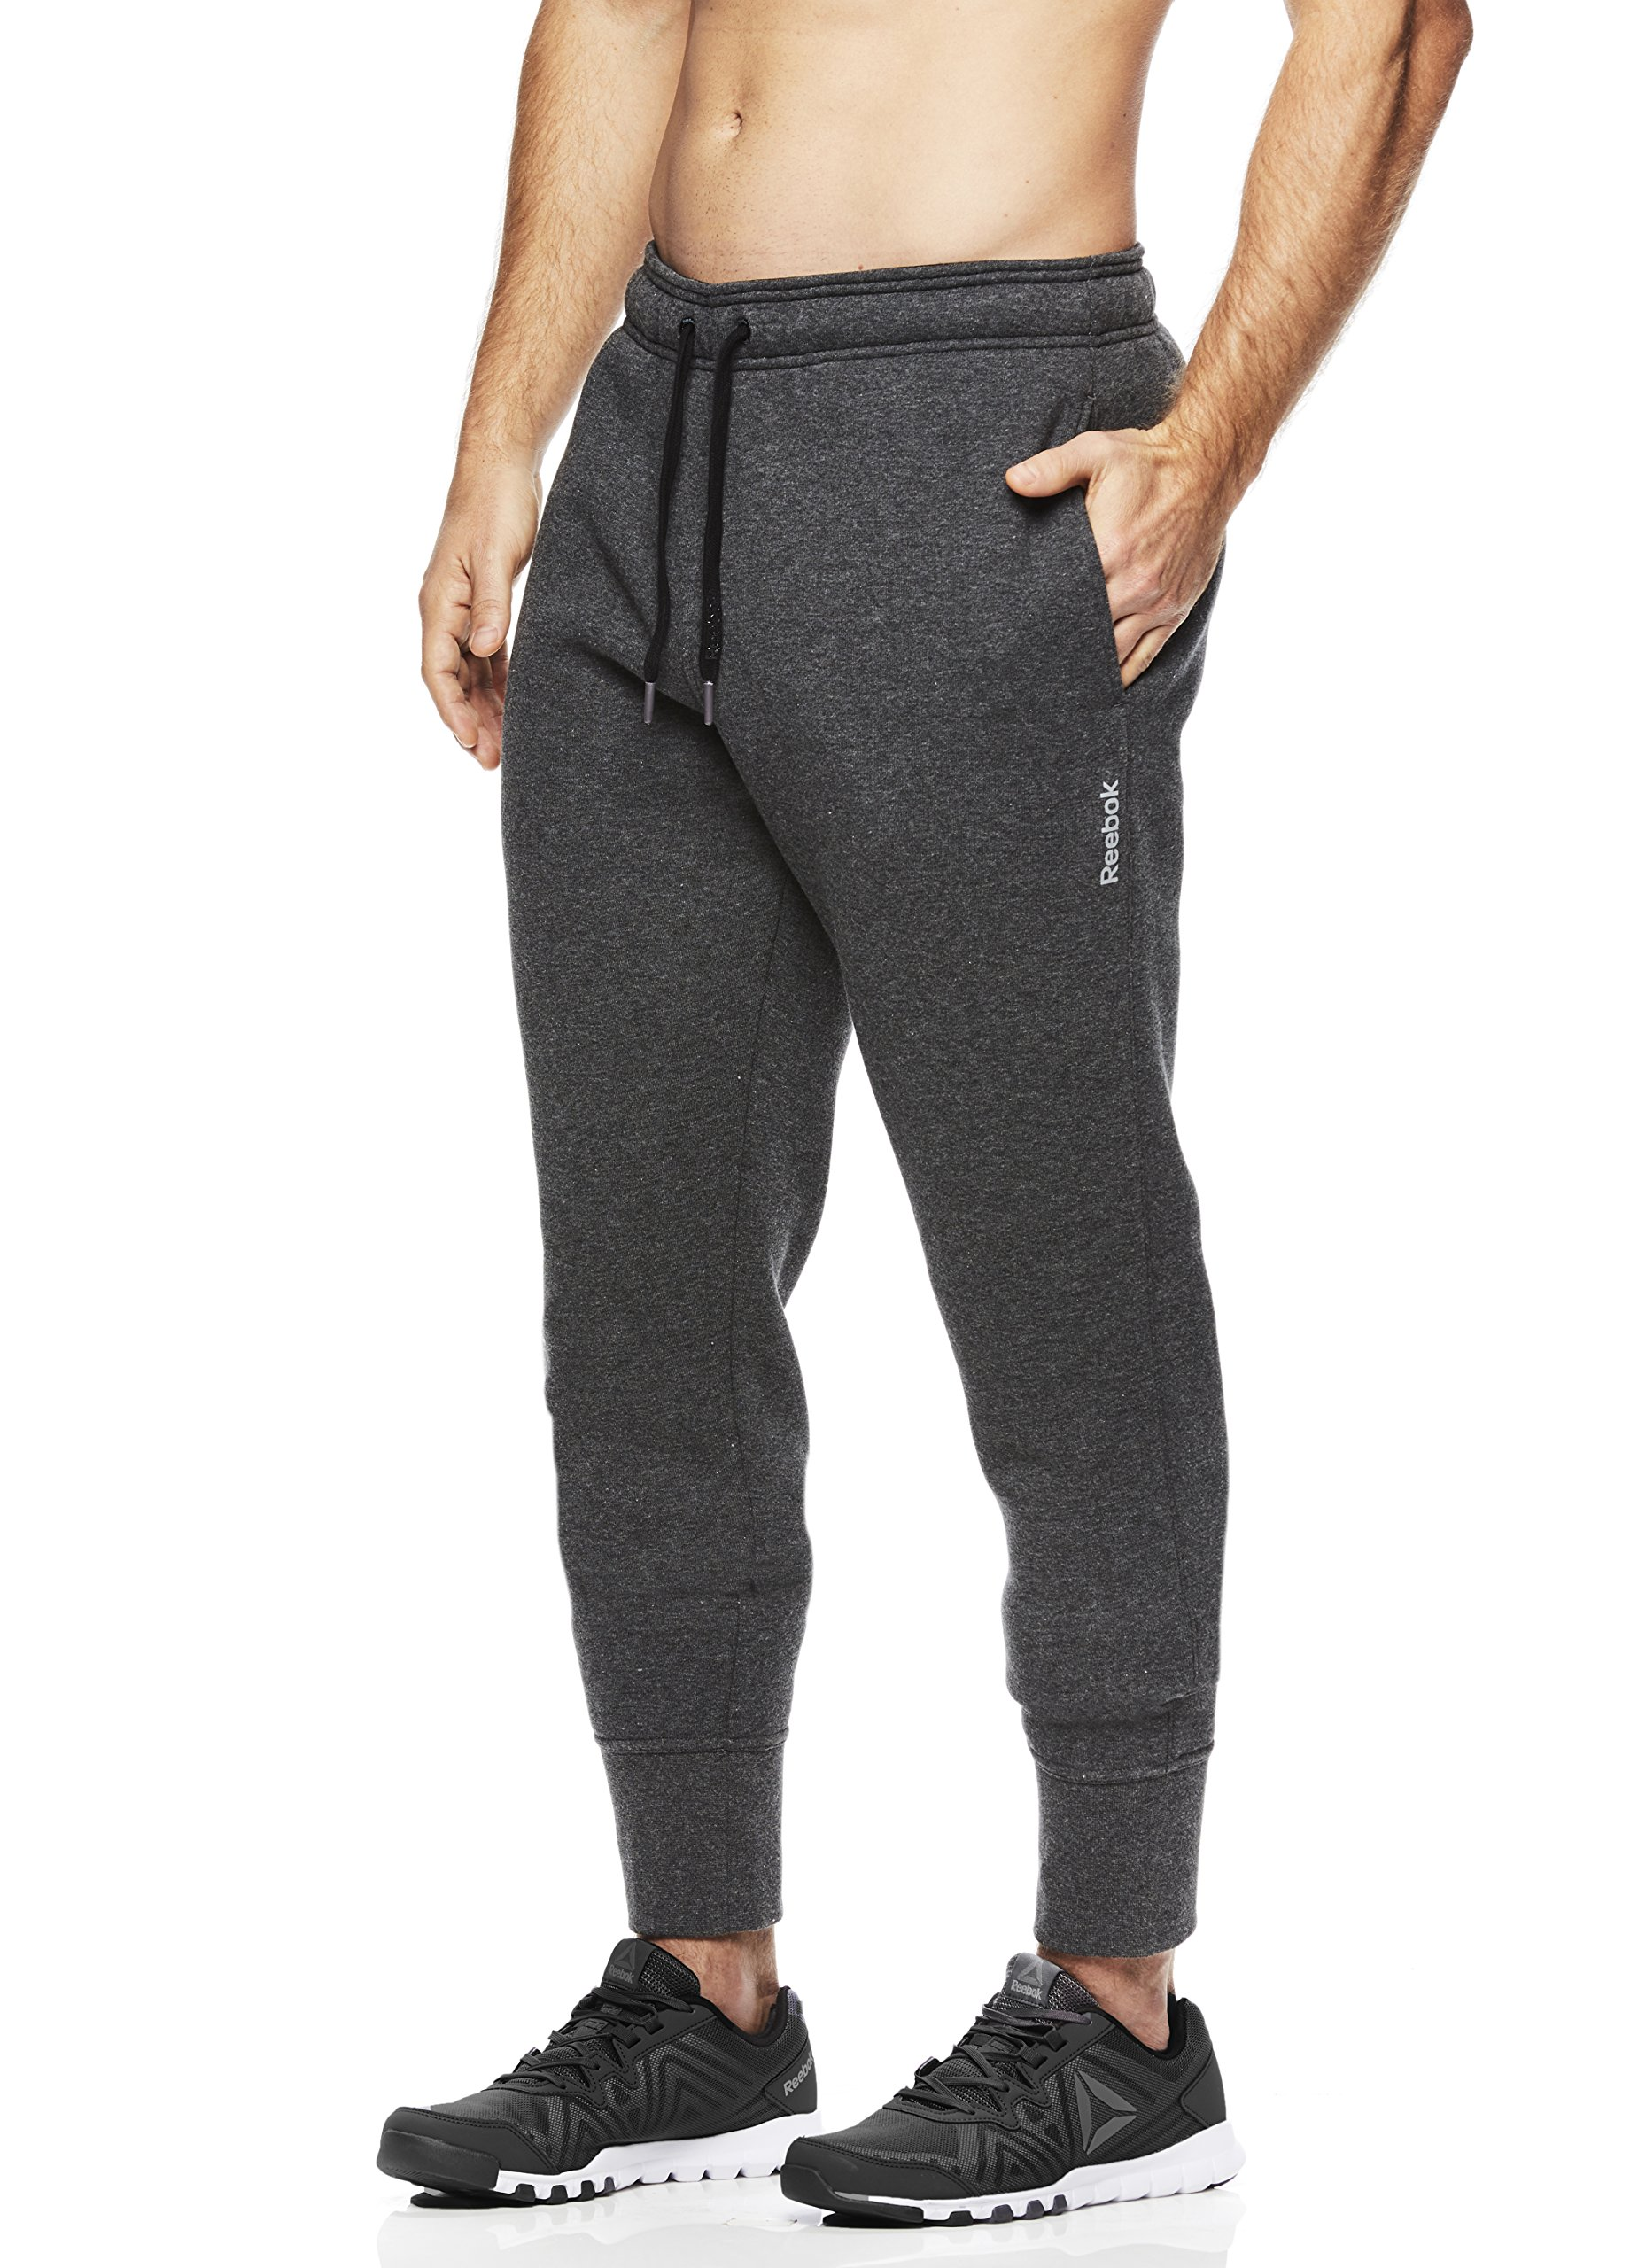 eb15f8e43096 Reebok Men s Core Performance Jogger Workout Pants Dark Shade ...